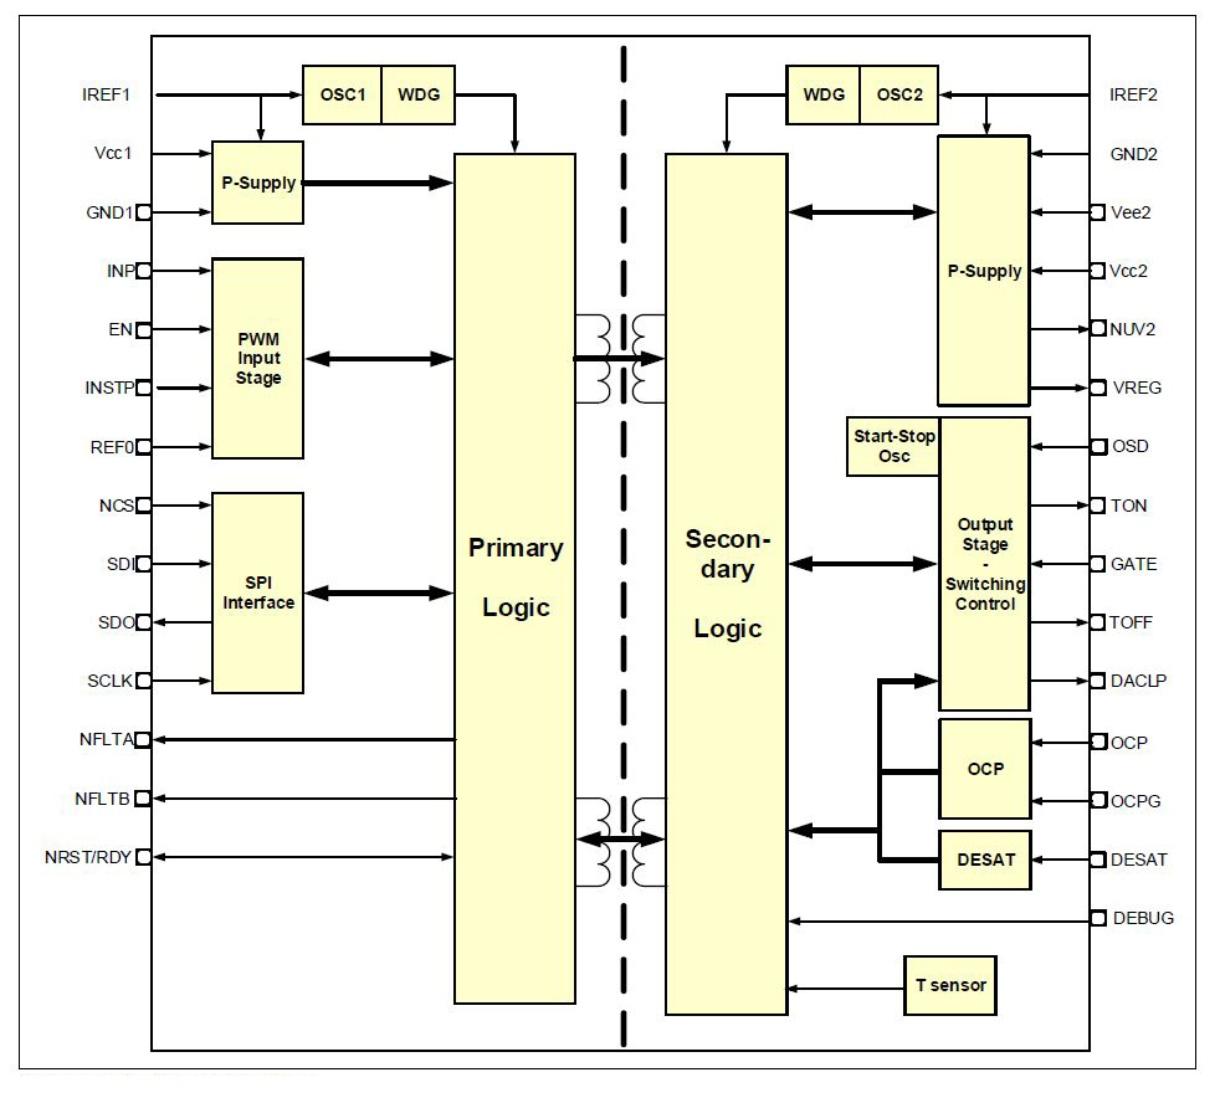 Vaporesso Target Circuit Board Wiring Diagram Best Secret Electronic Timer Engineersgarage Diagrams 1edi2001as Infineon Technologies